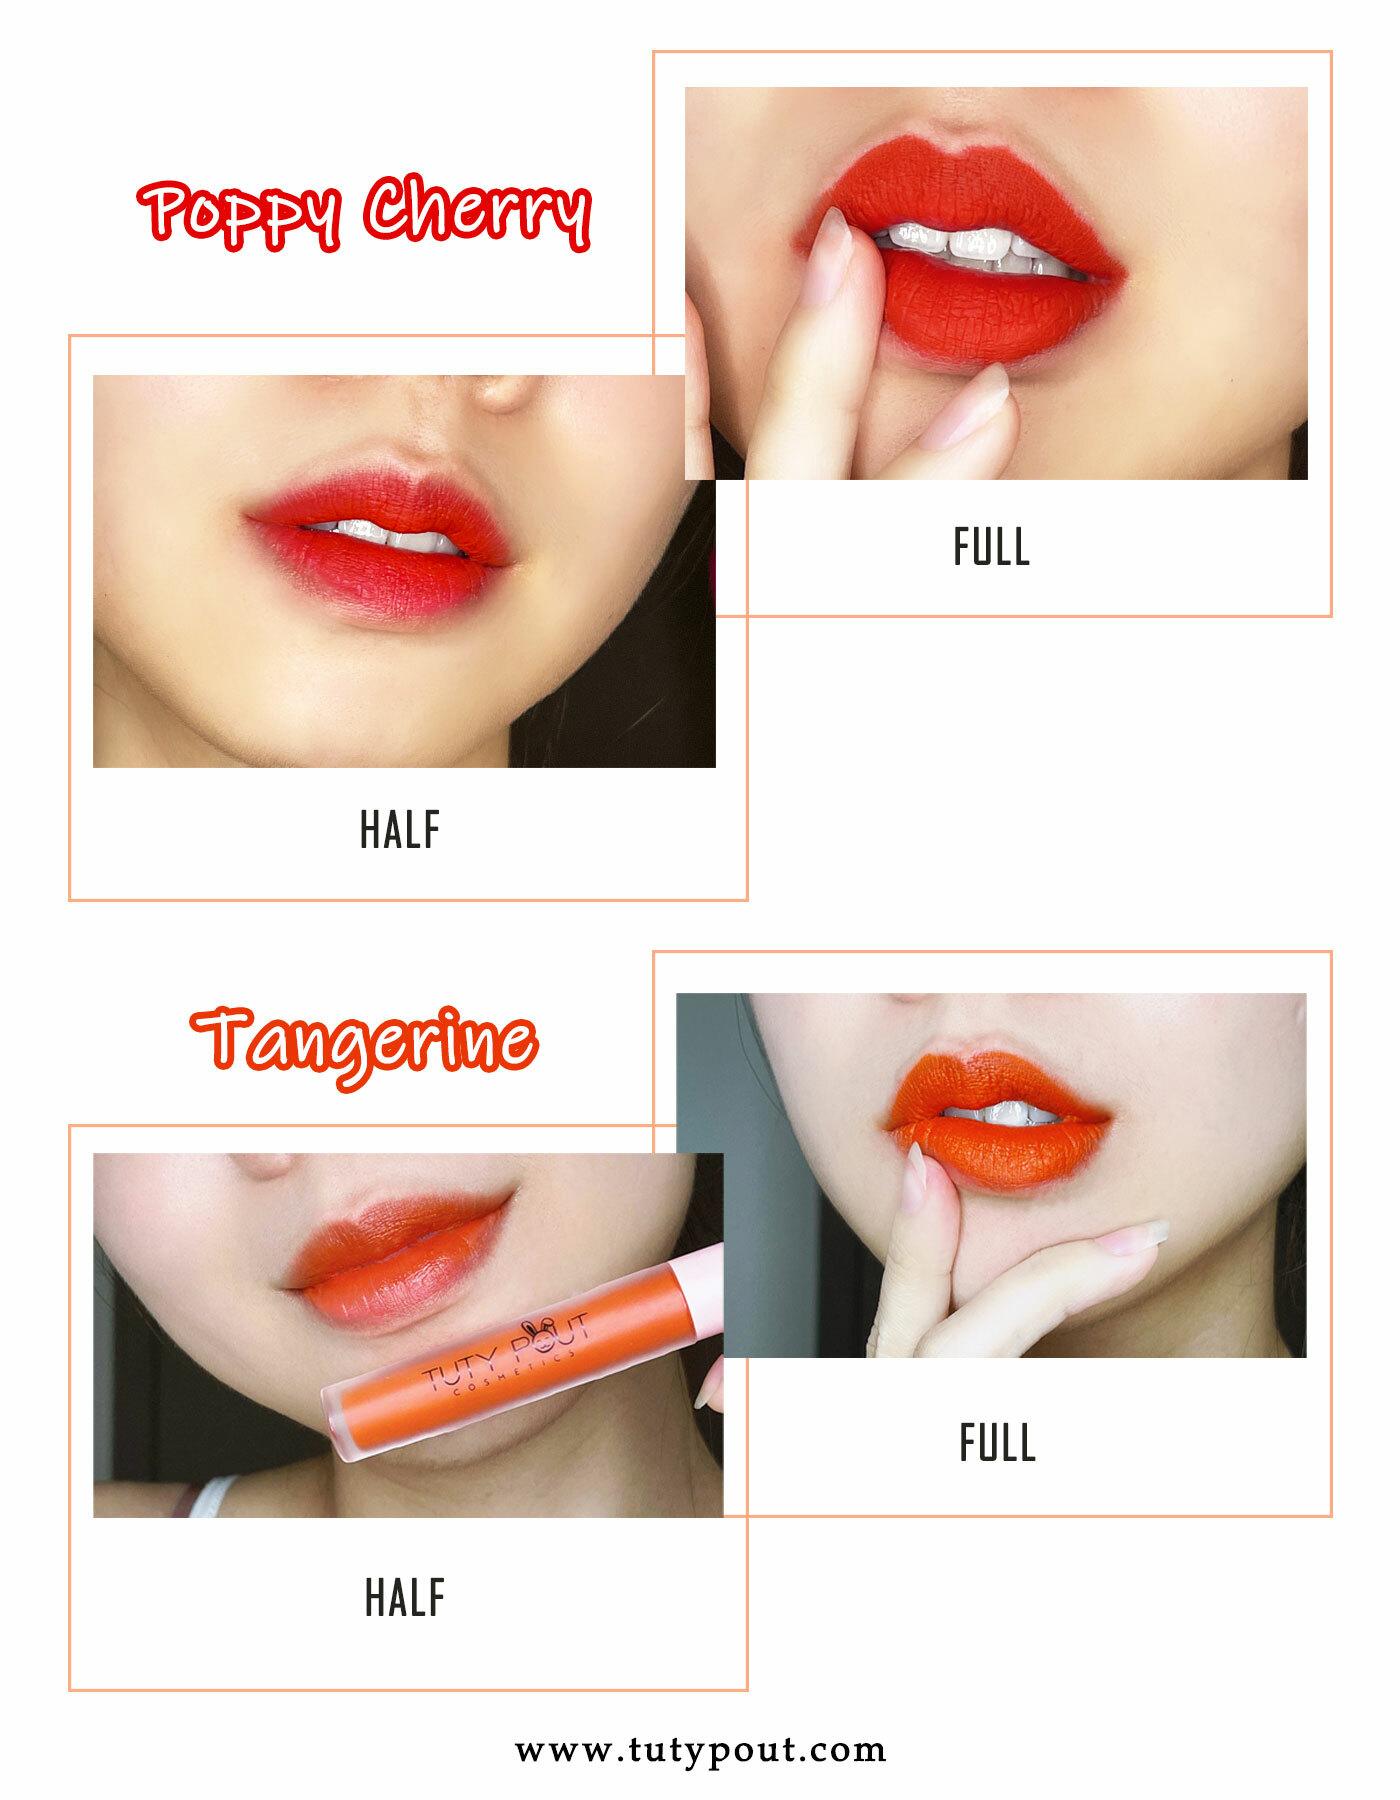 Rogue series - 100% vegan & cruelty free matte liquid long-lasting RED lipstick (collage)